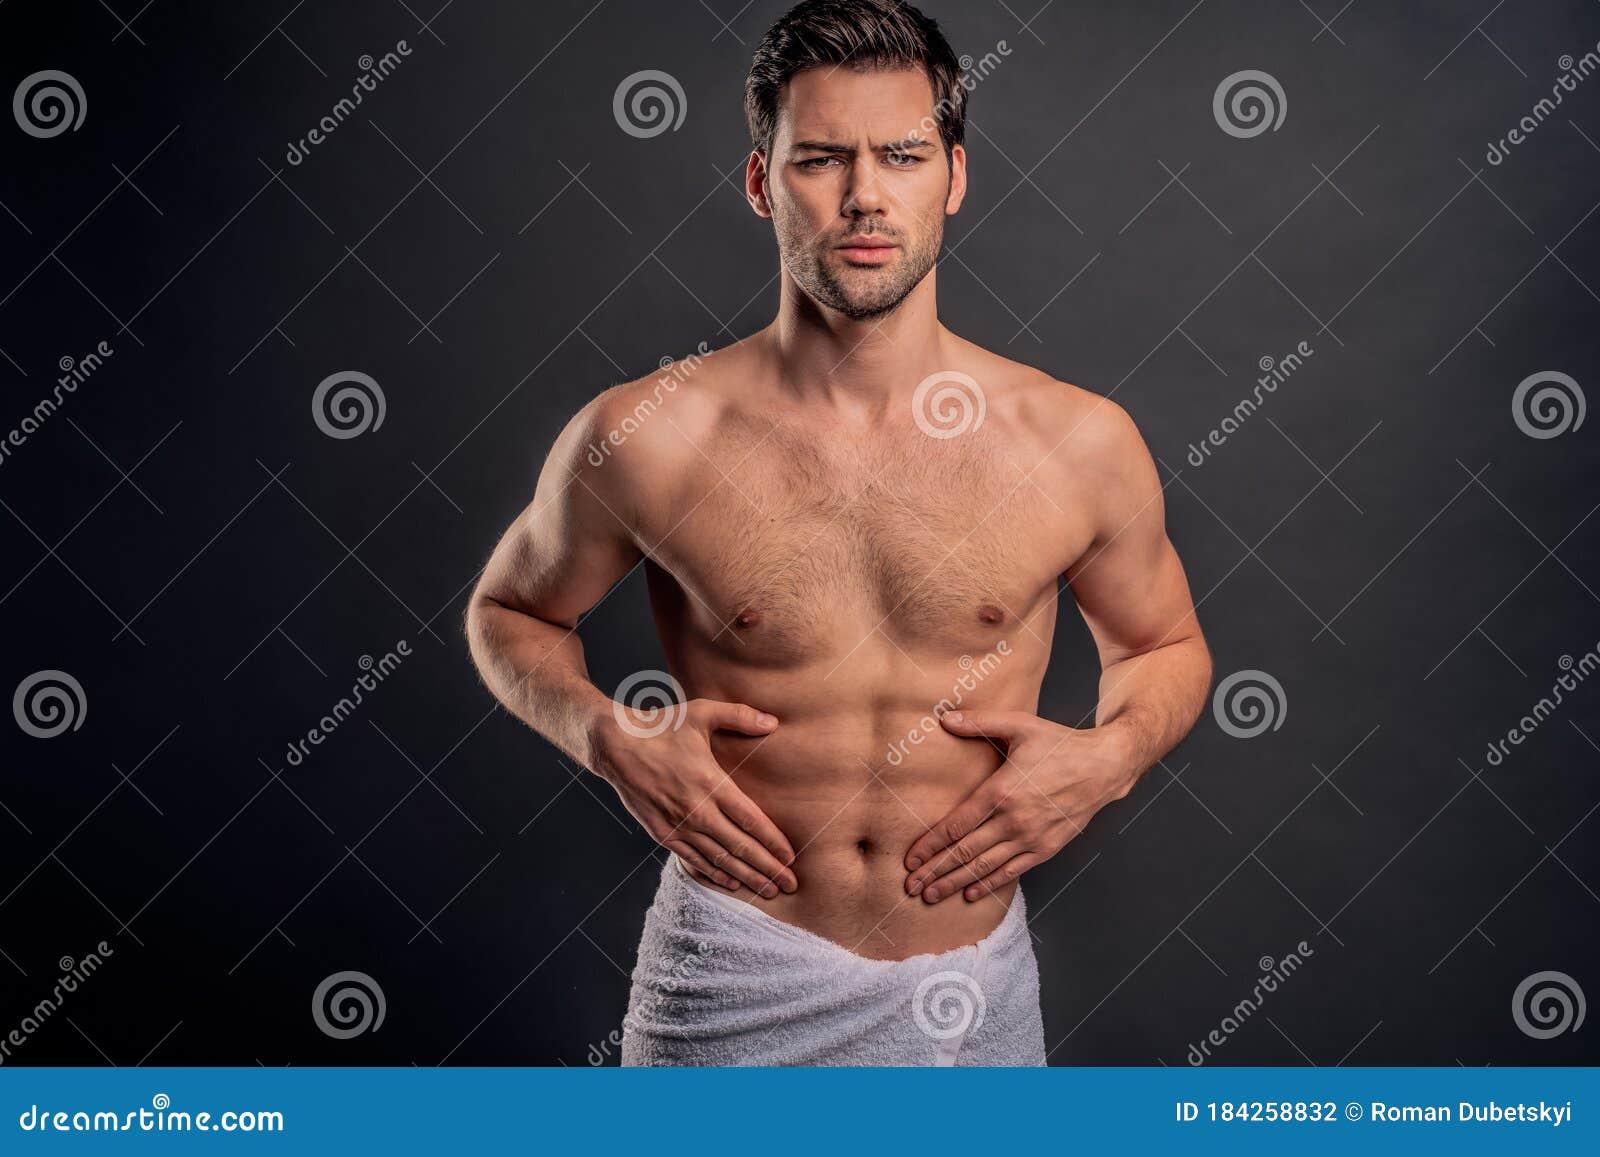 Studio Shot Of Young Muscular Persian Man Holding Gun And